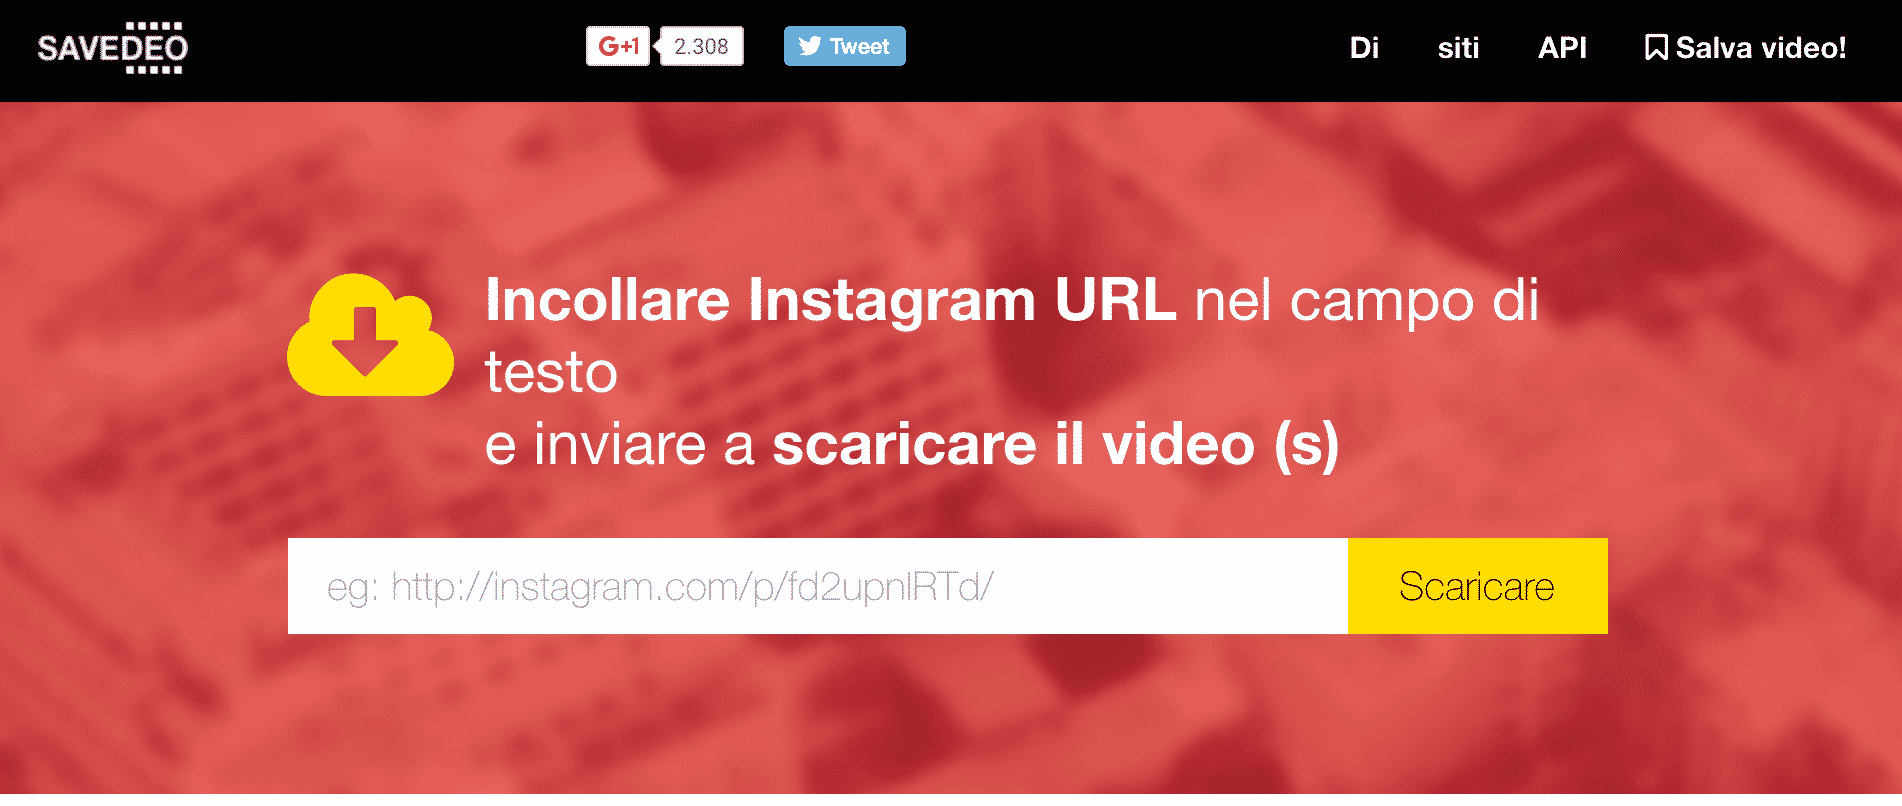 salvare video da Instagram